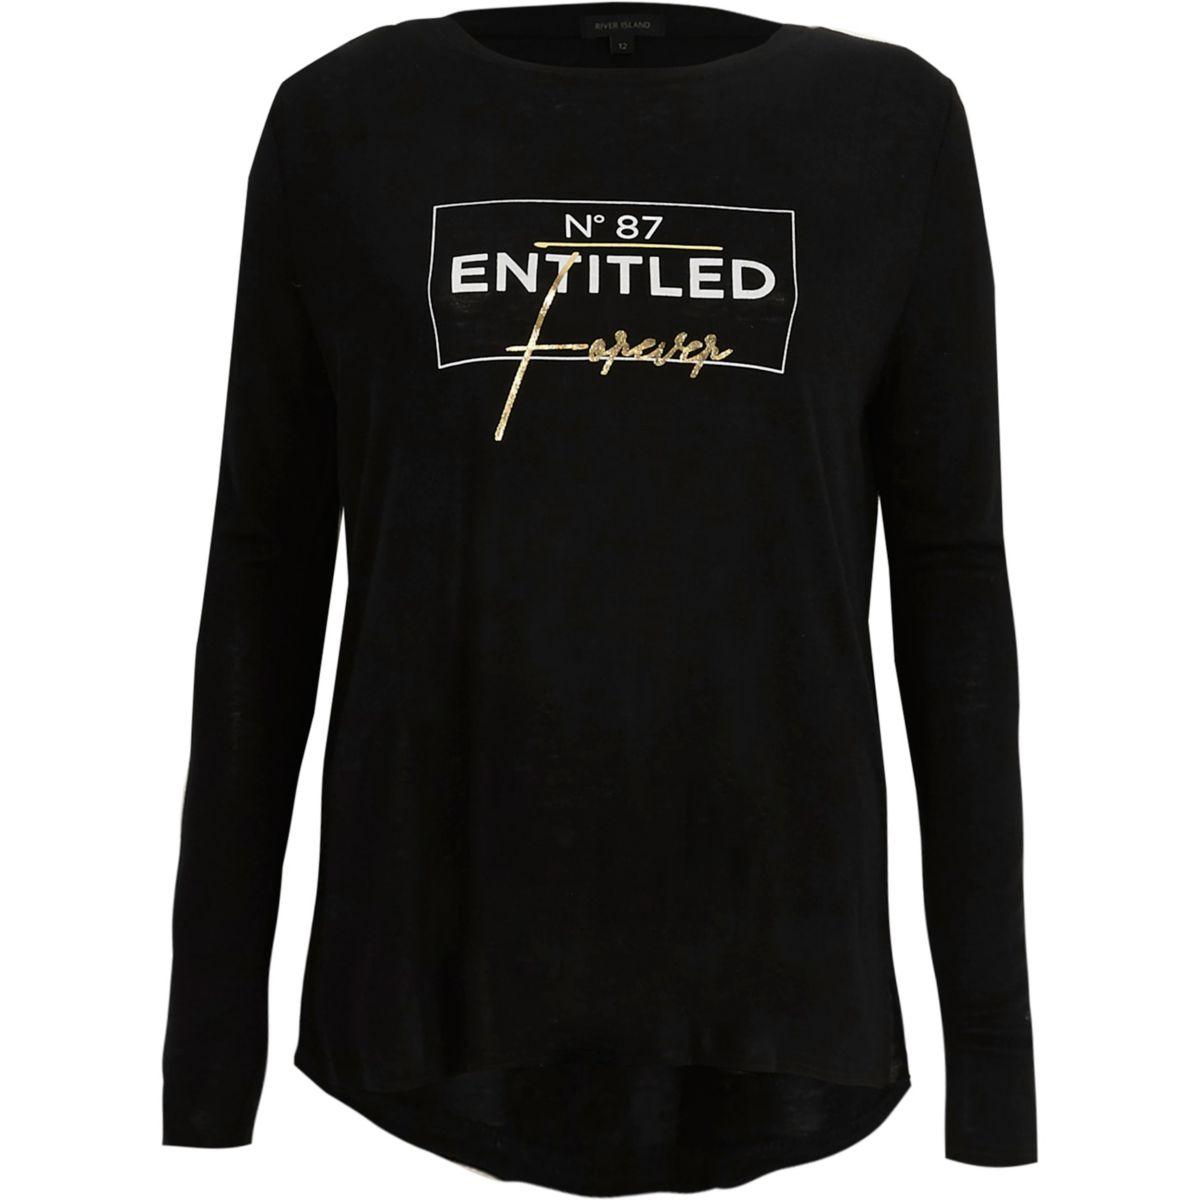 Black 'entitled' foil long sleeve T-shirt